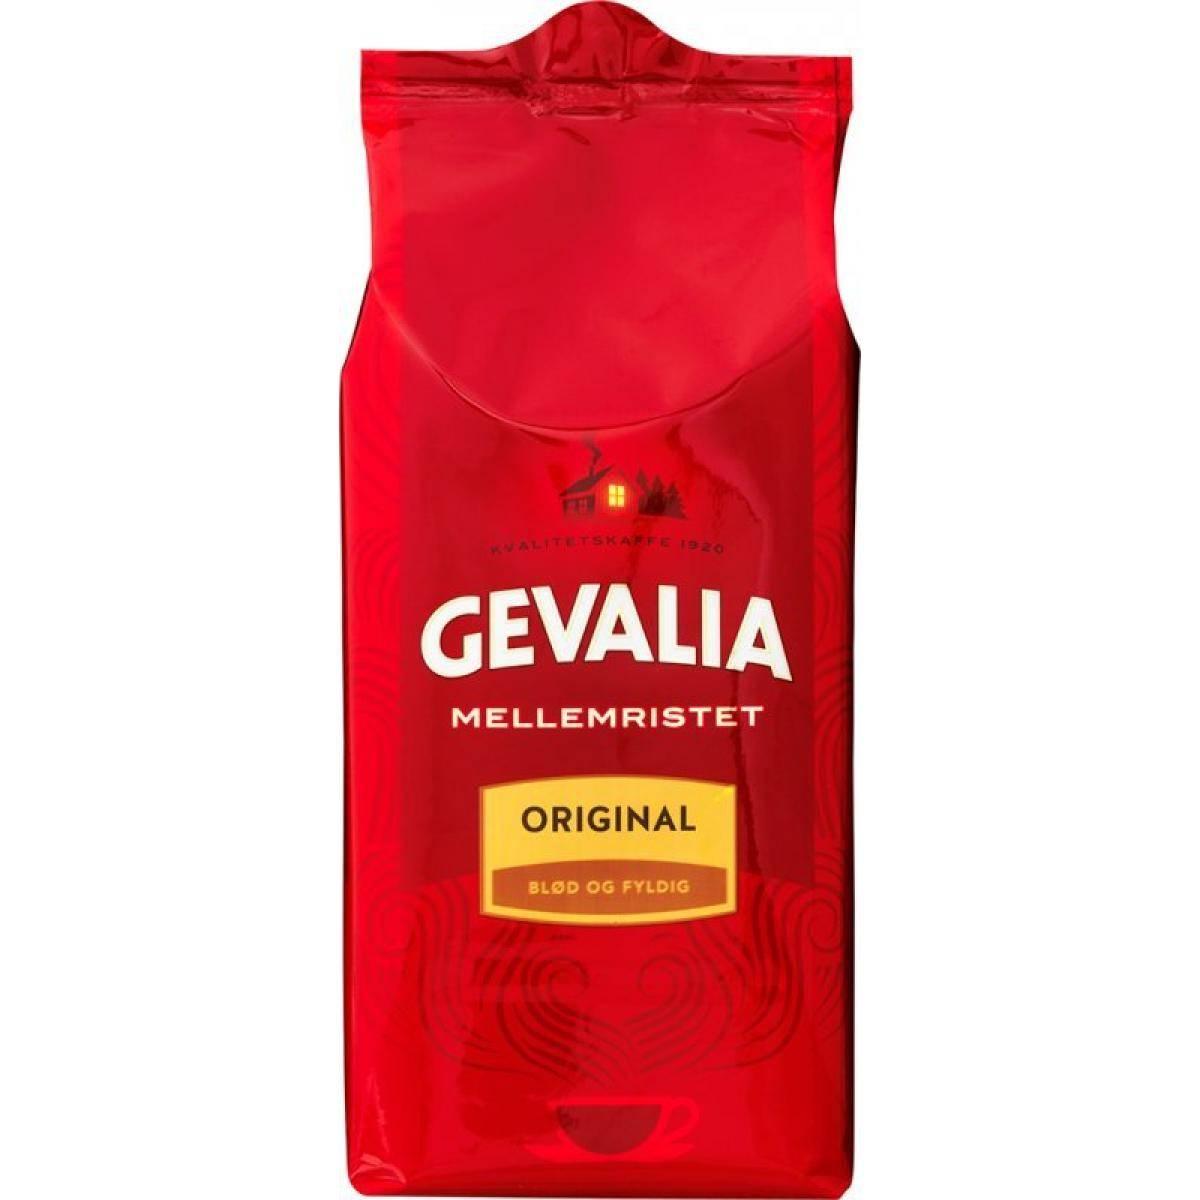 Кофе gevalia (гевалия) - бренд, ассортимент, цена